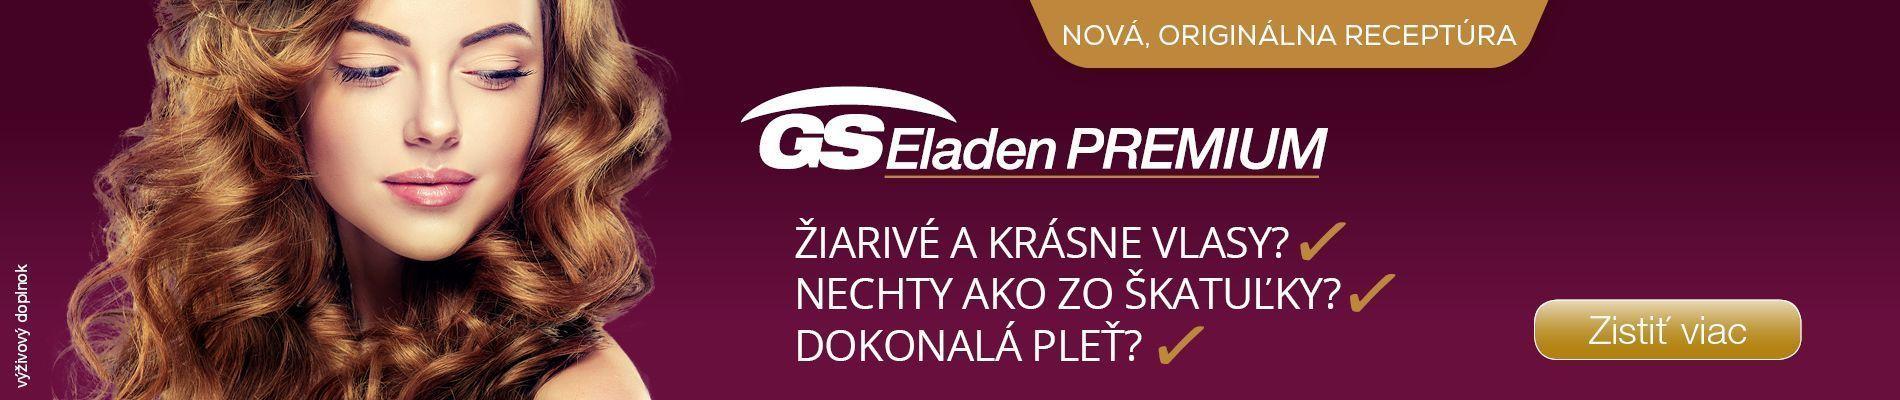 banner GS Eladen Premium